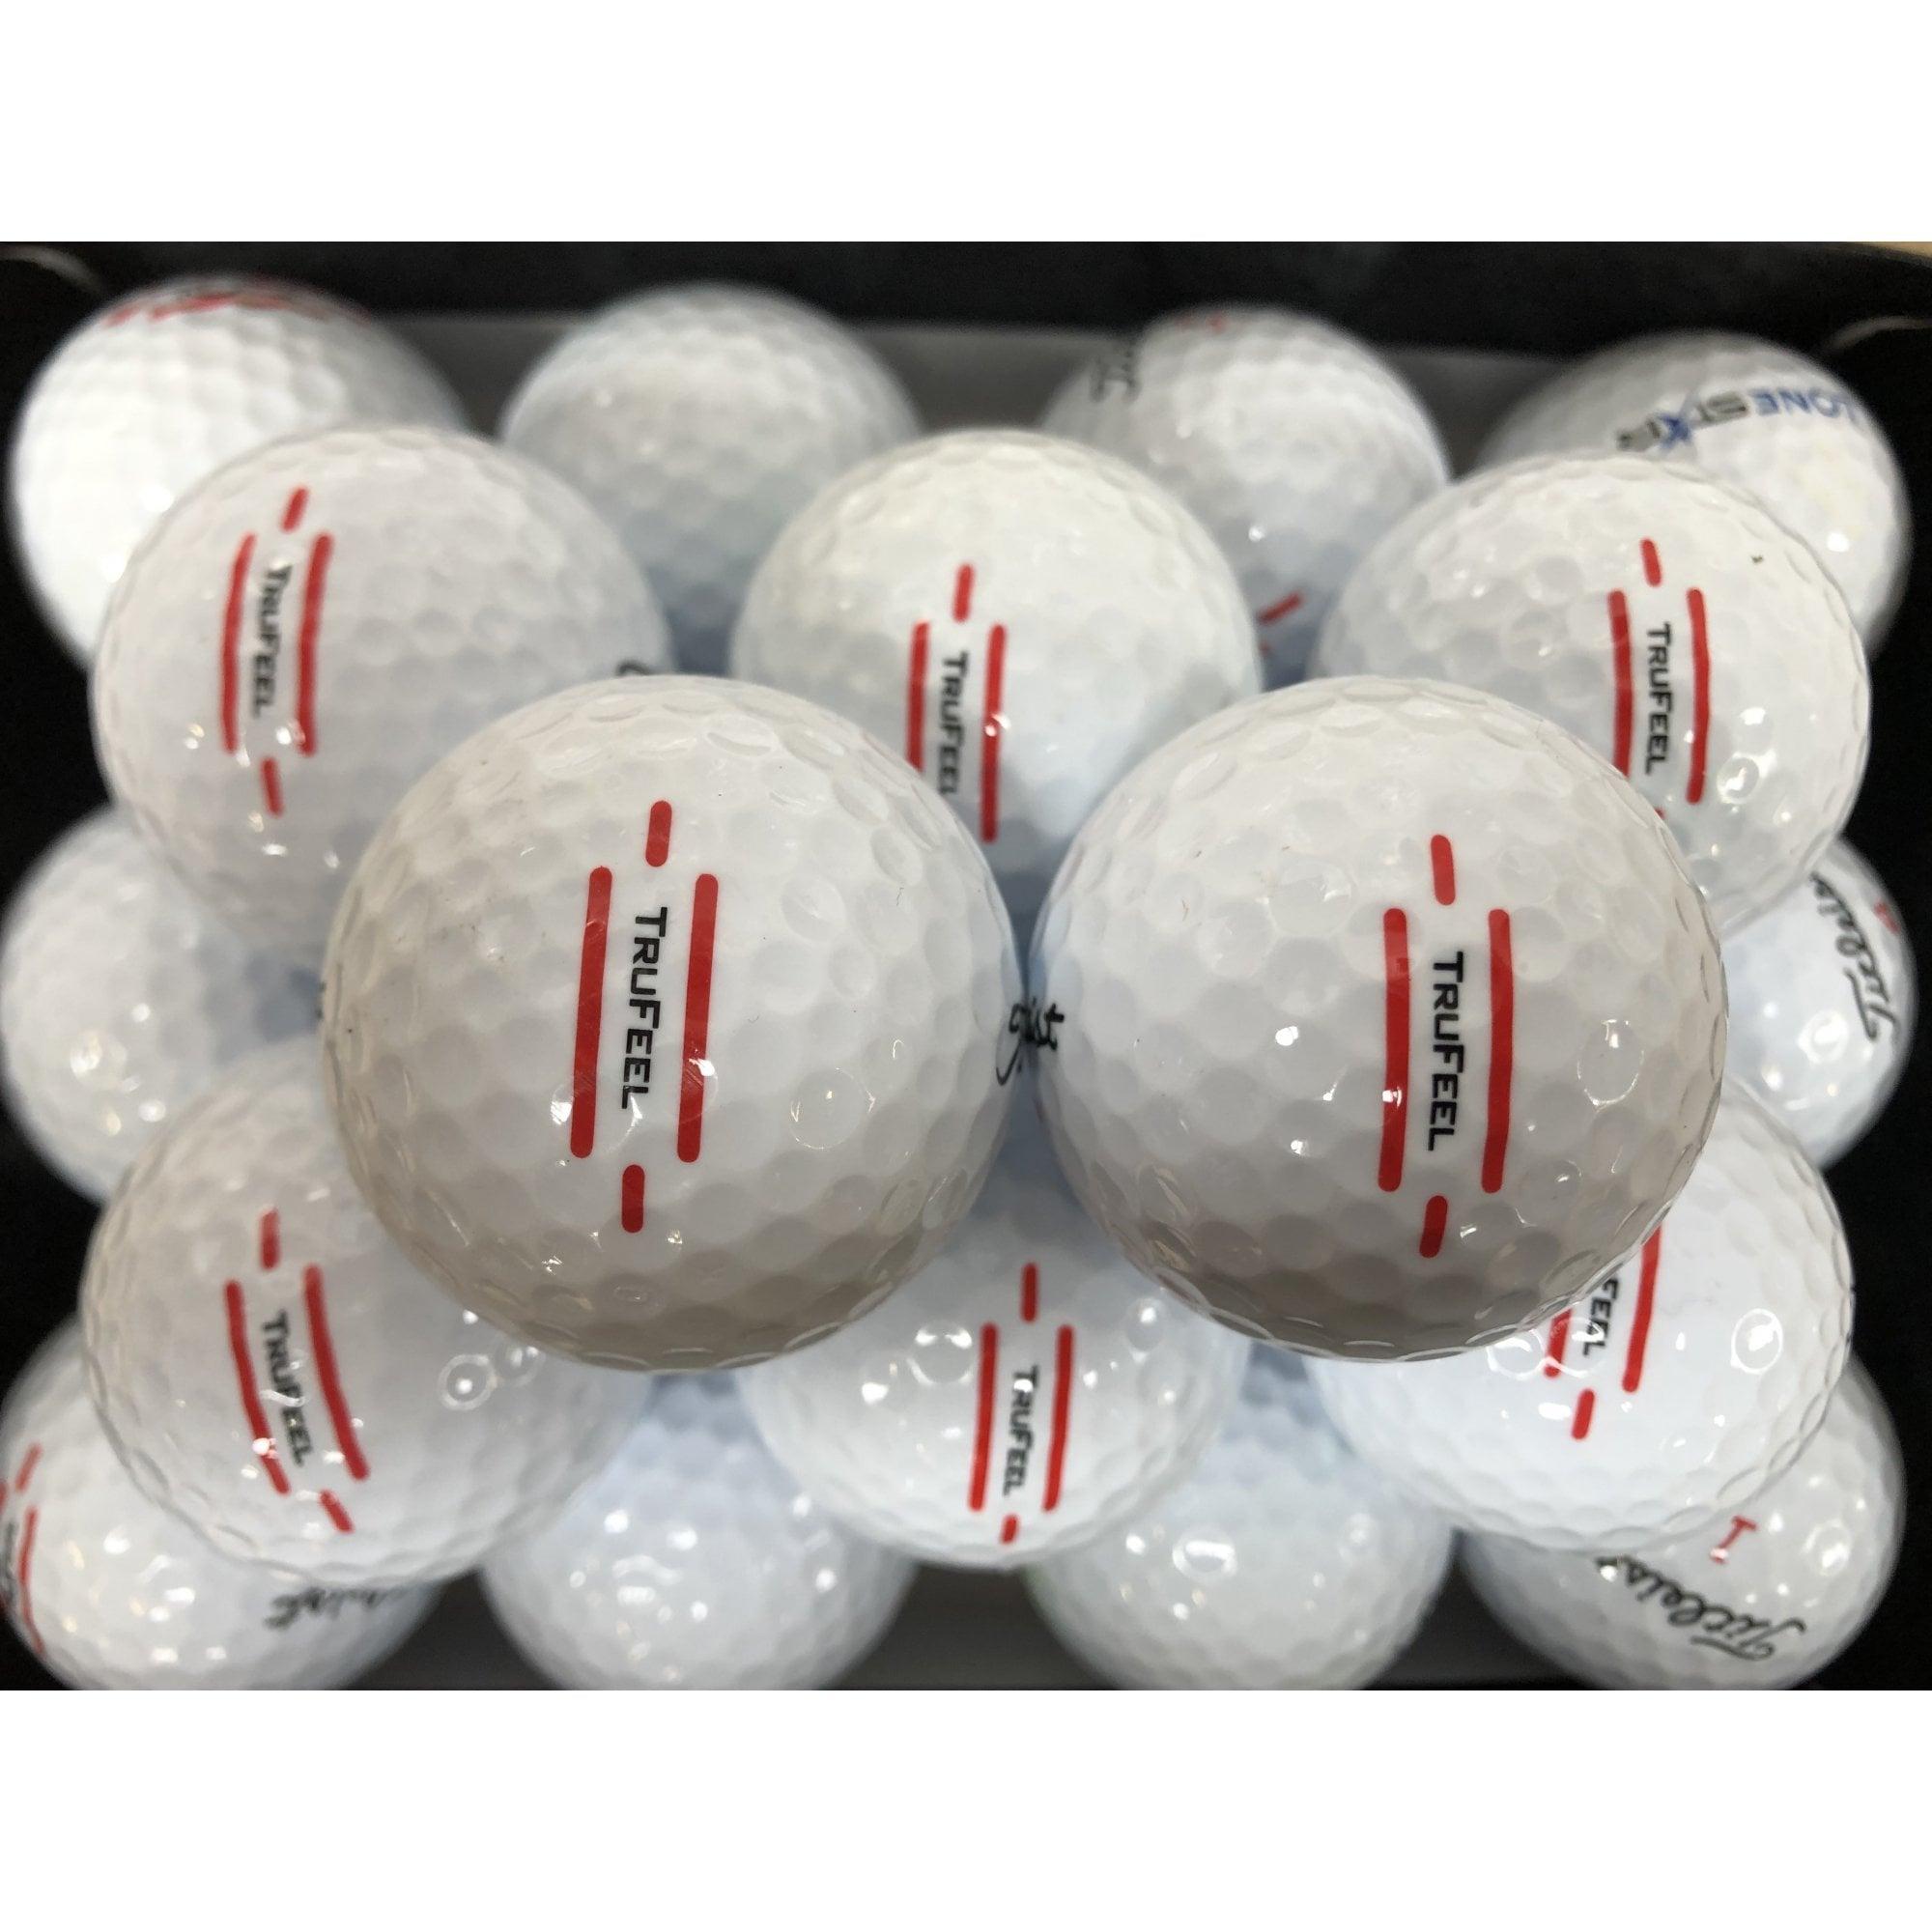 Titleist Trufeel Golf Balls - Premier Lakeballs Ltd